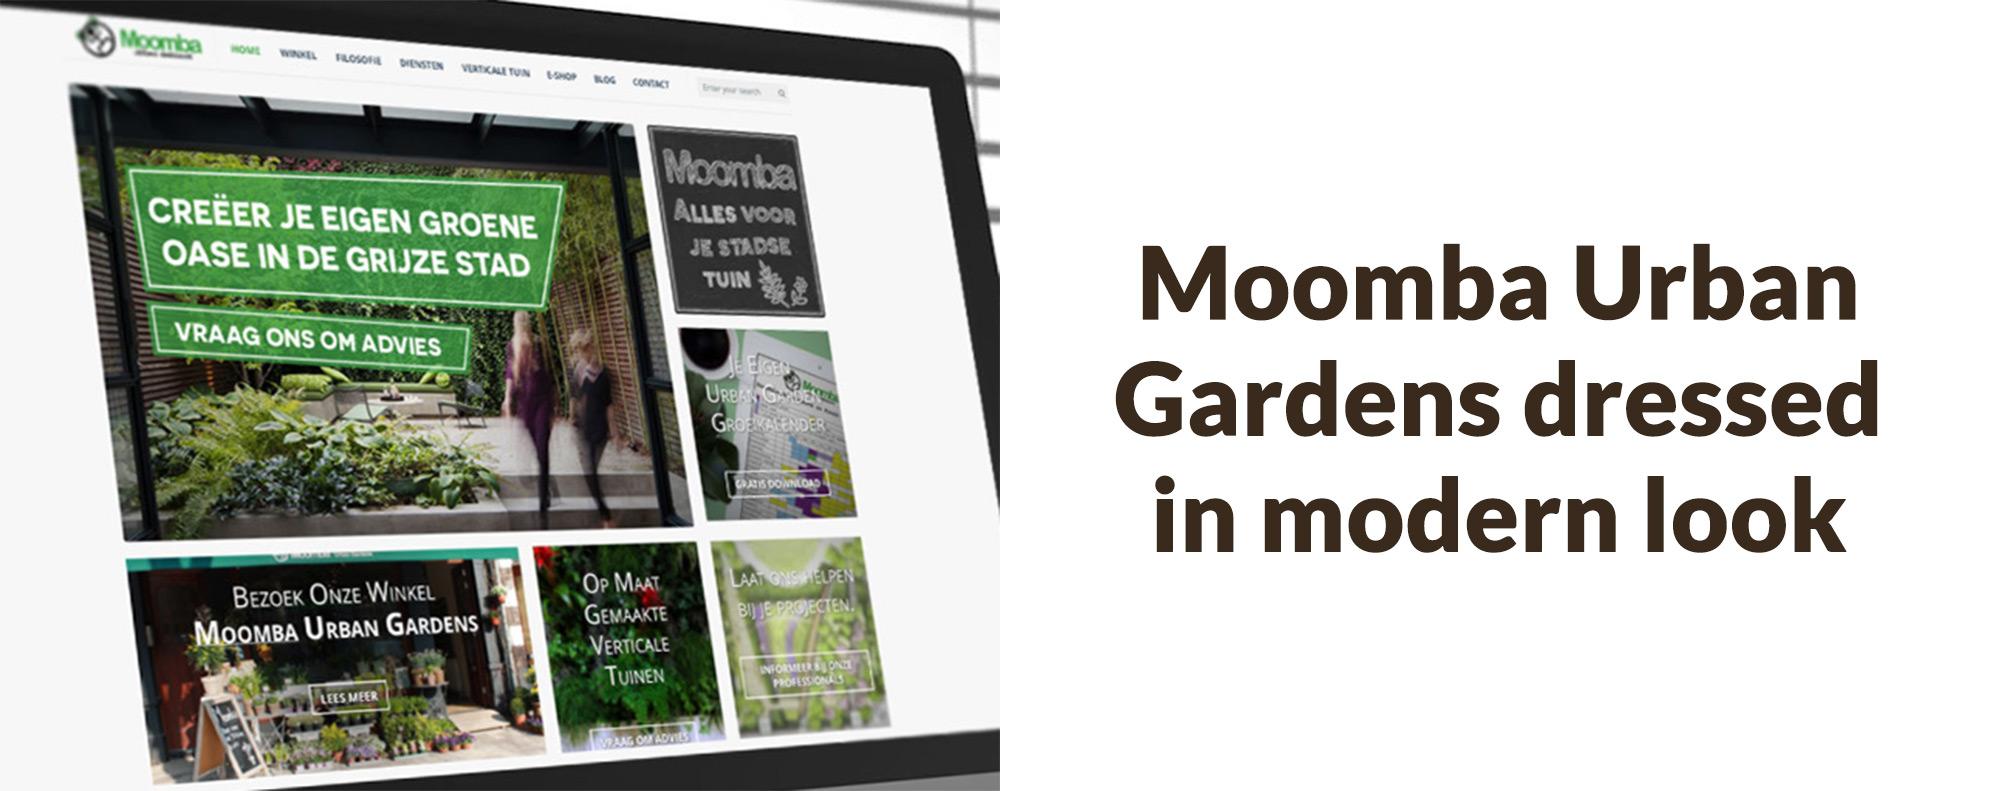 Moomba Urban Gardens